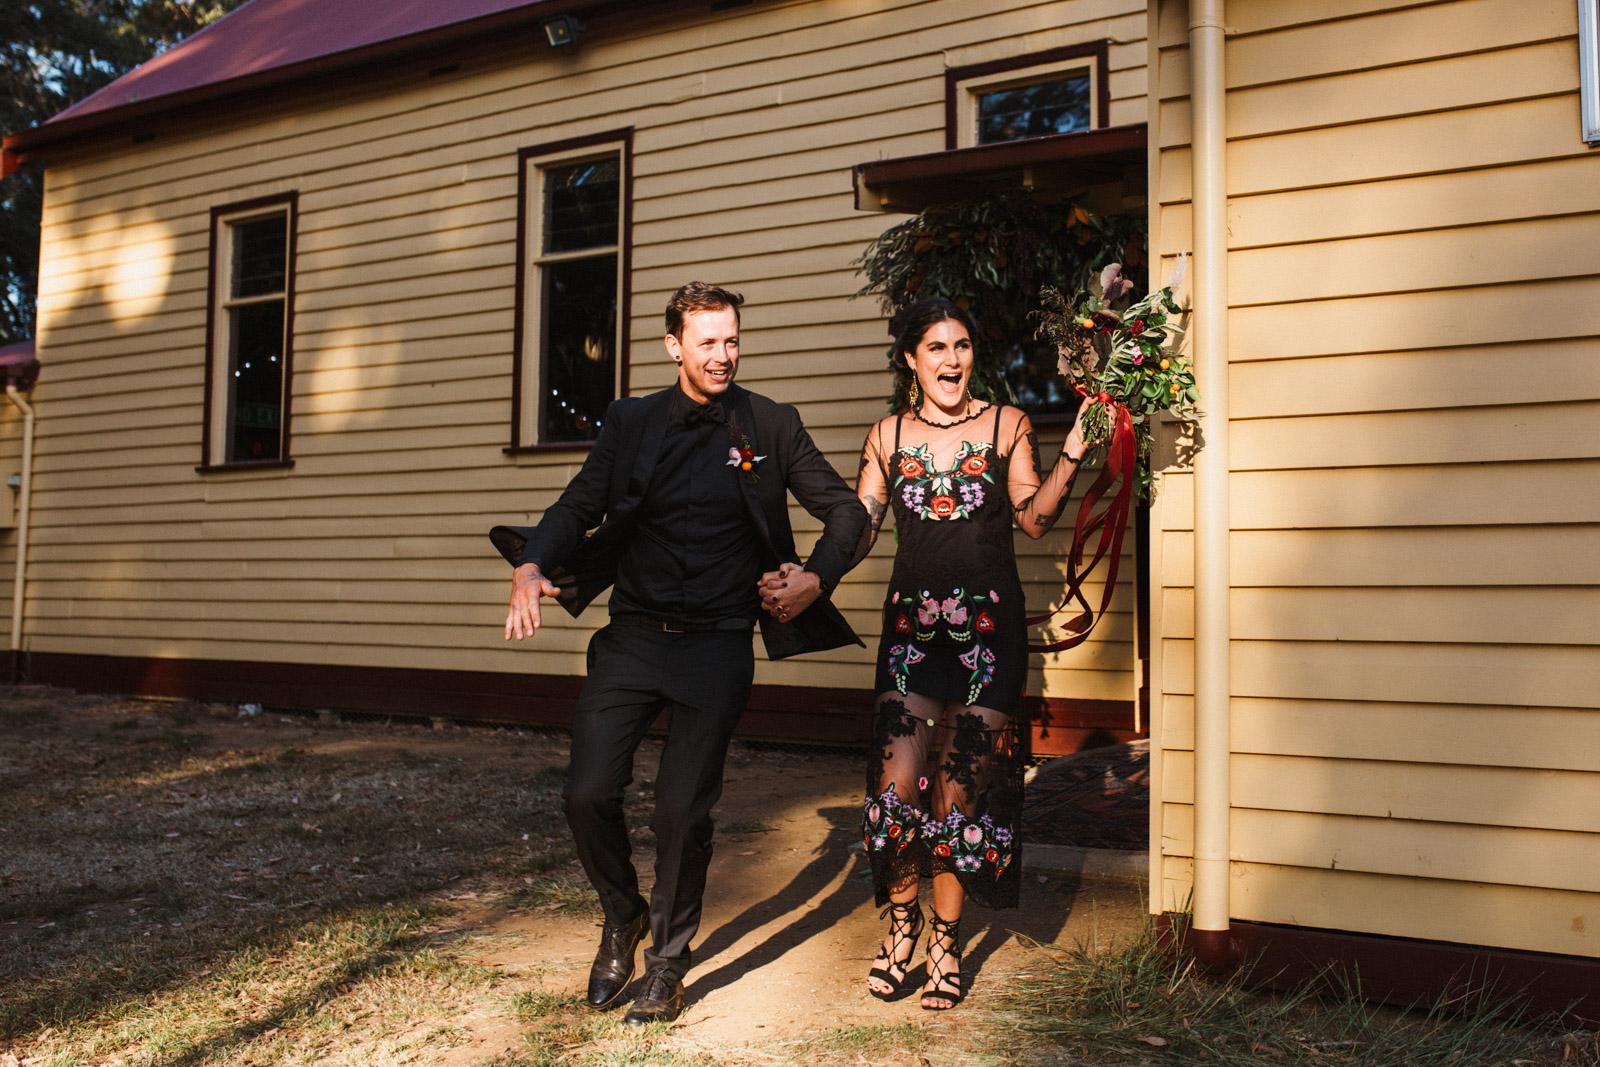 ZD-Melbourne Wedding Photographer-Dean Raphael-105.jpg